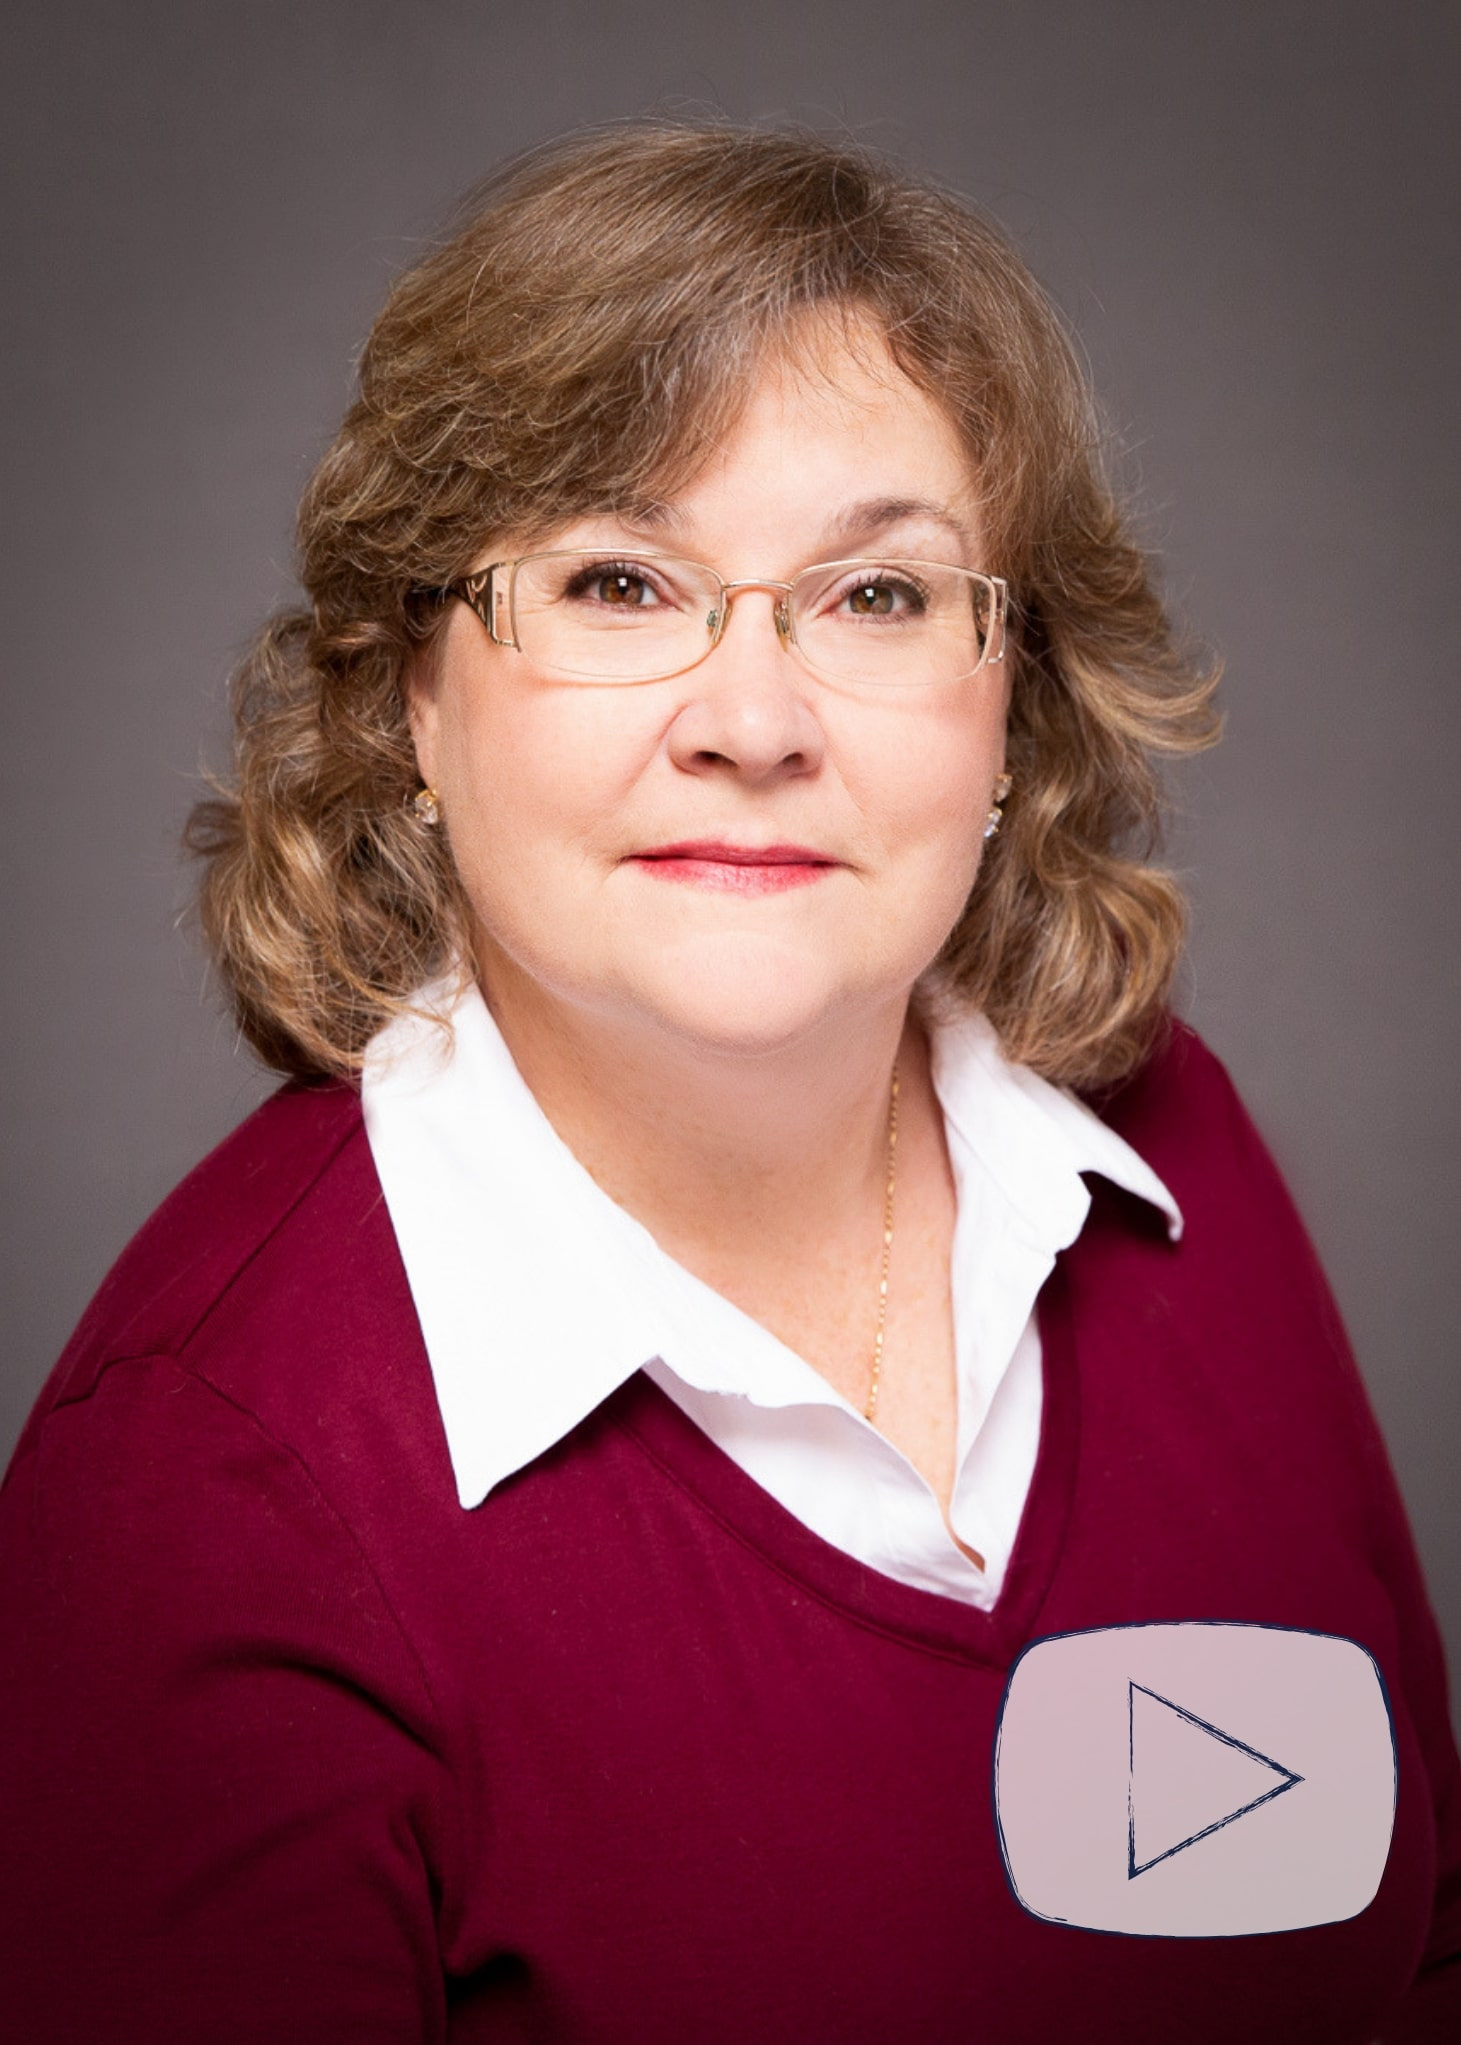 Karen Cox, trusted Agent, Windermere Real estate, Oak Harbor, Whidbey Island, Washington